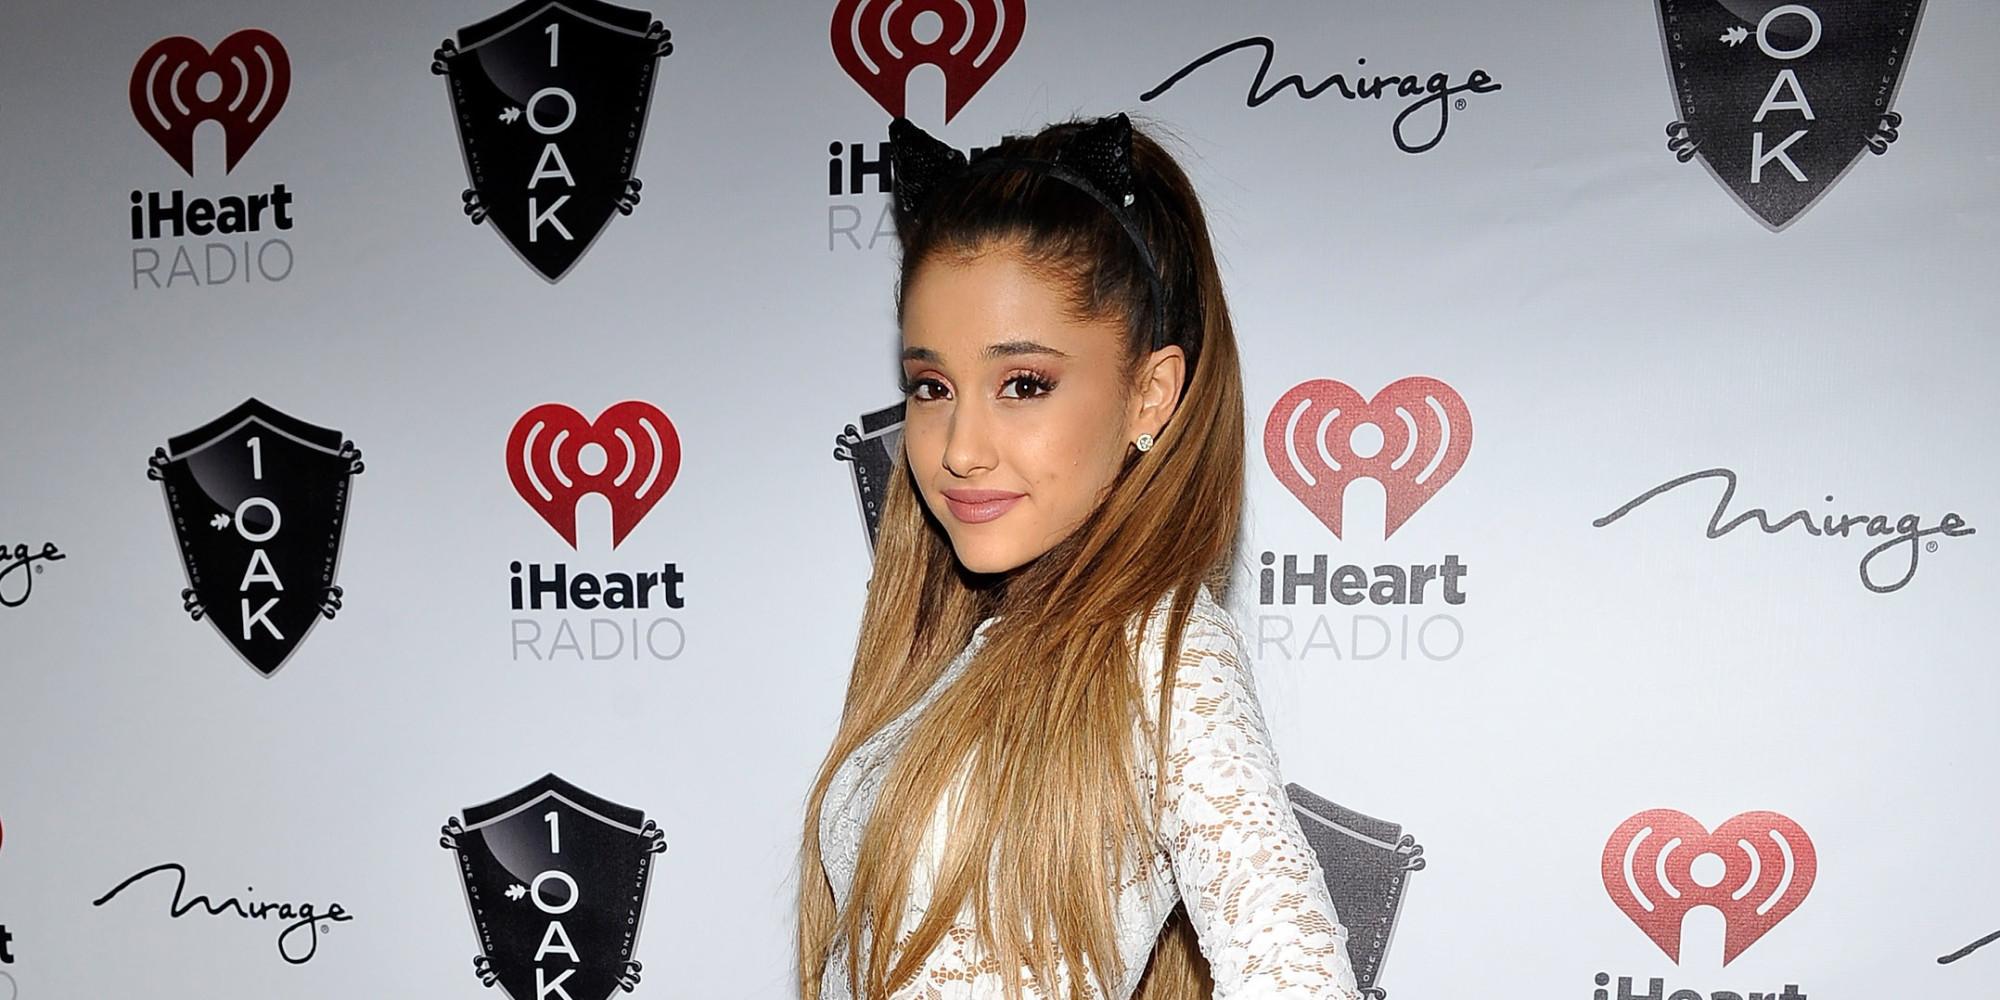 Ariana Grande Denies Leaked Nude Pic is Her - YouTube